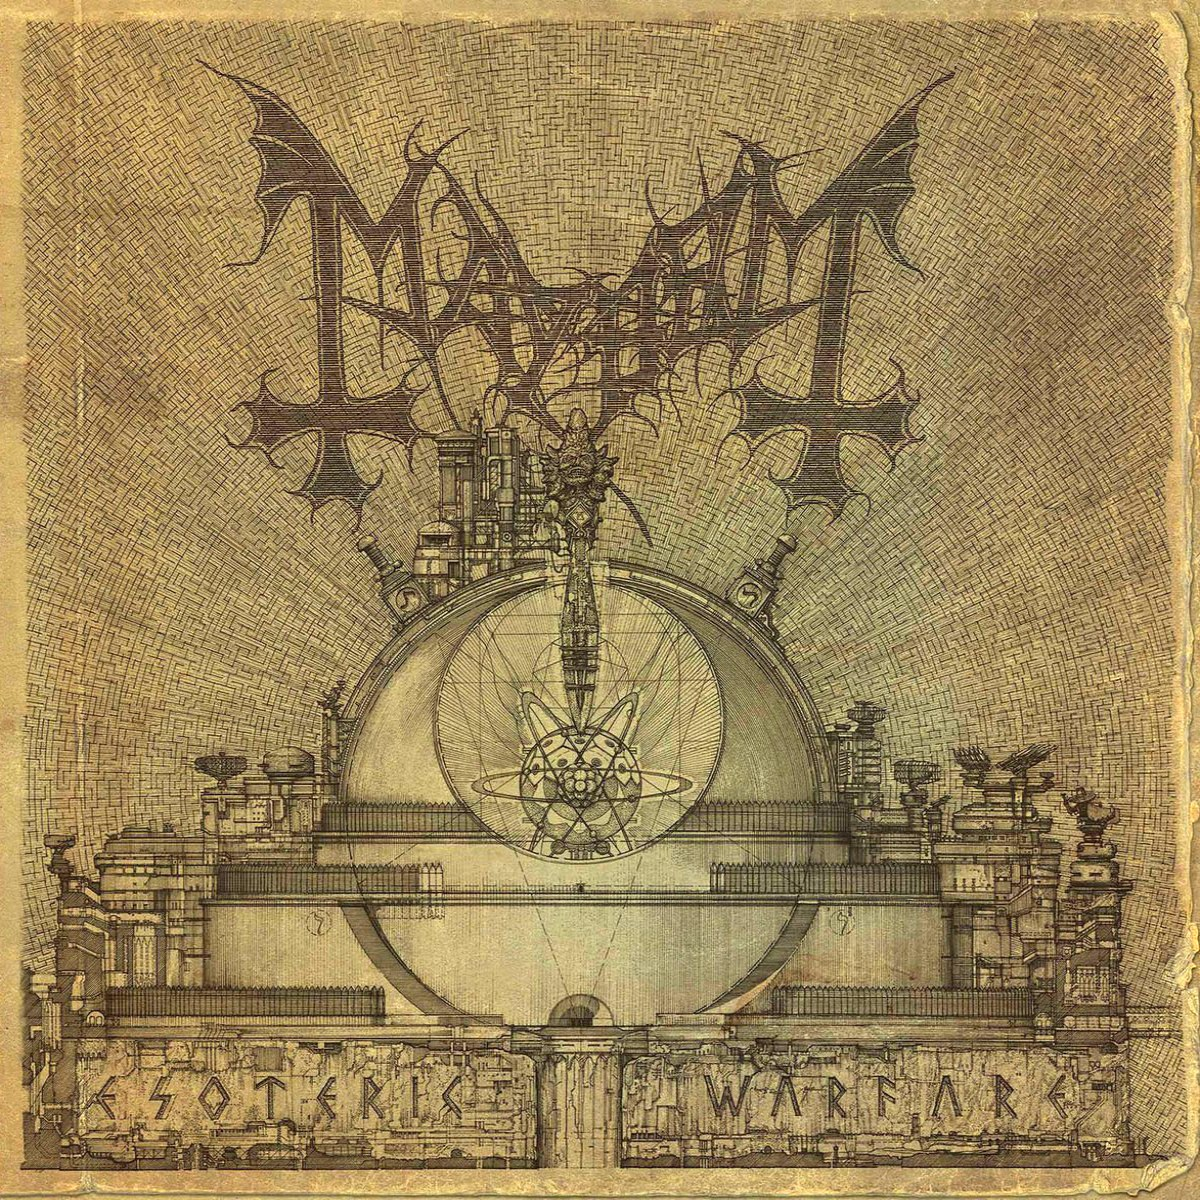 Reviews for Mayhem (NOR) - Esoteric Warfare